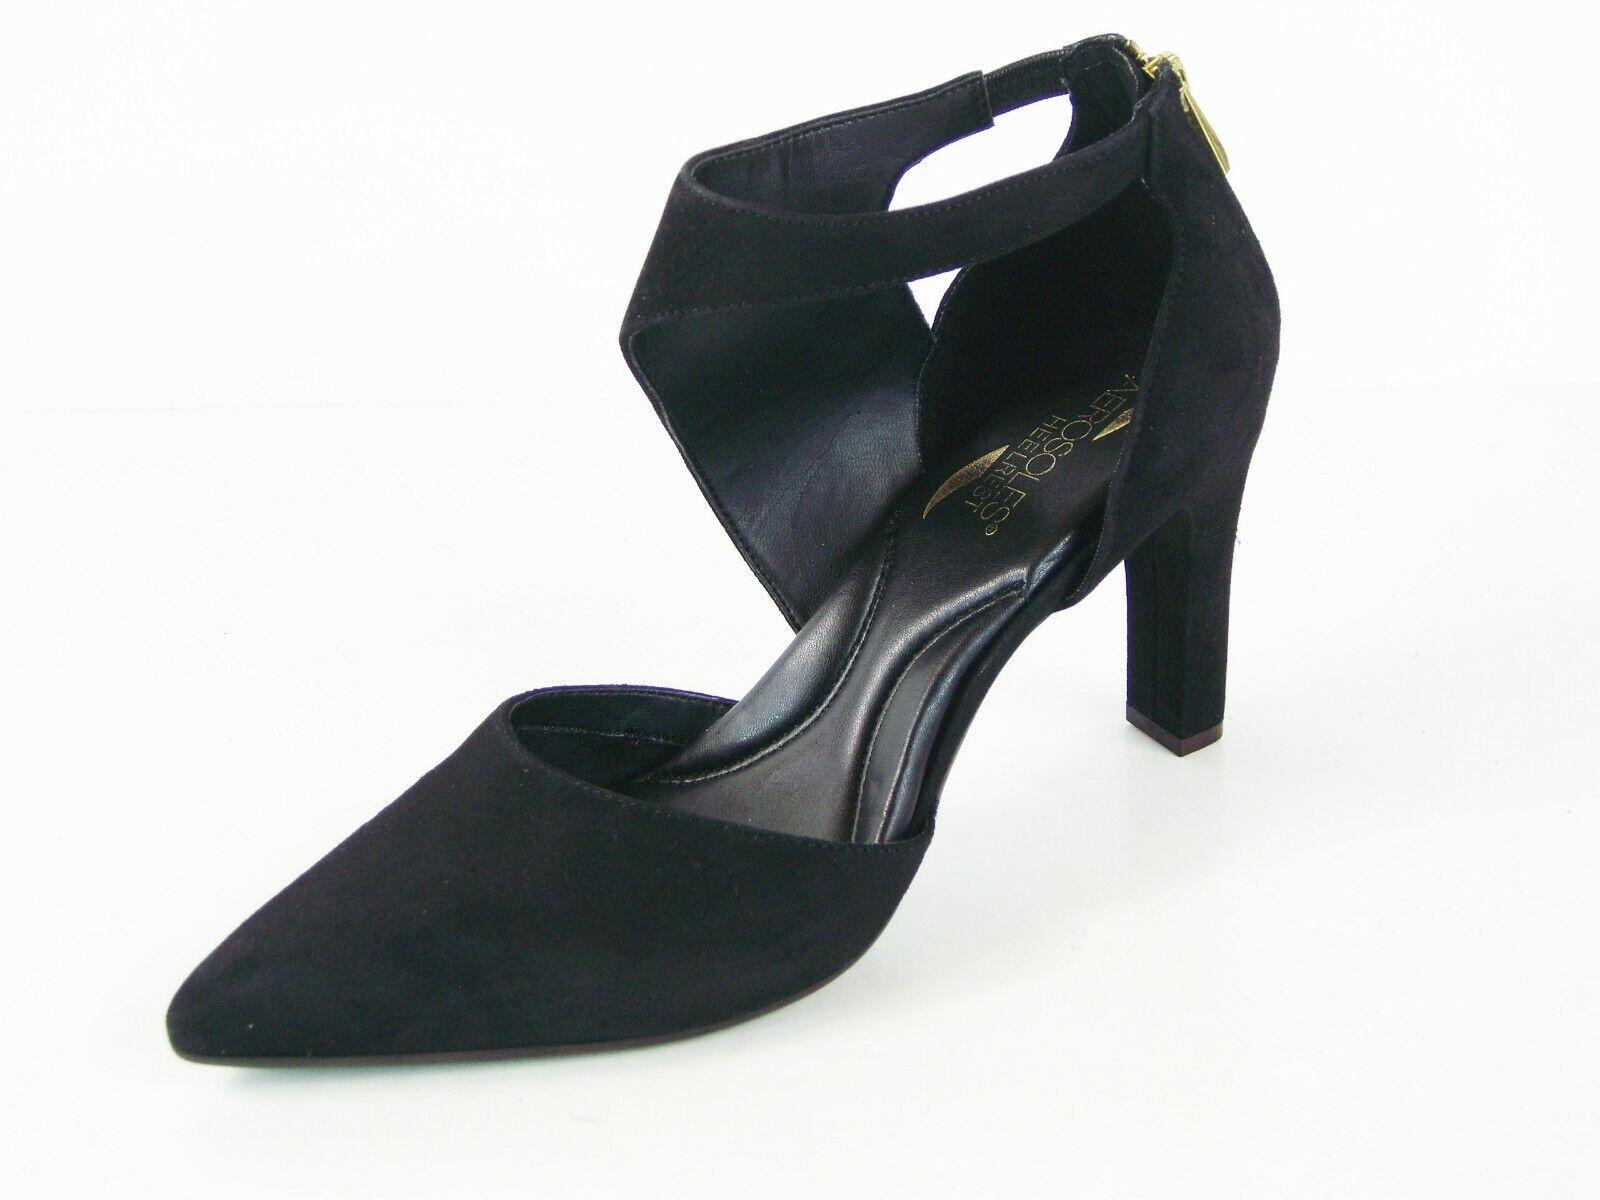 sport dello shopping online Aerosoles Tax Cut Dress Pumps Pumps Pumps - nero Suede - 9.5 M  molto popolare